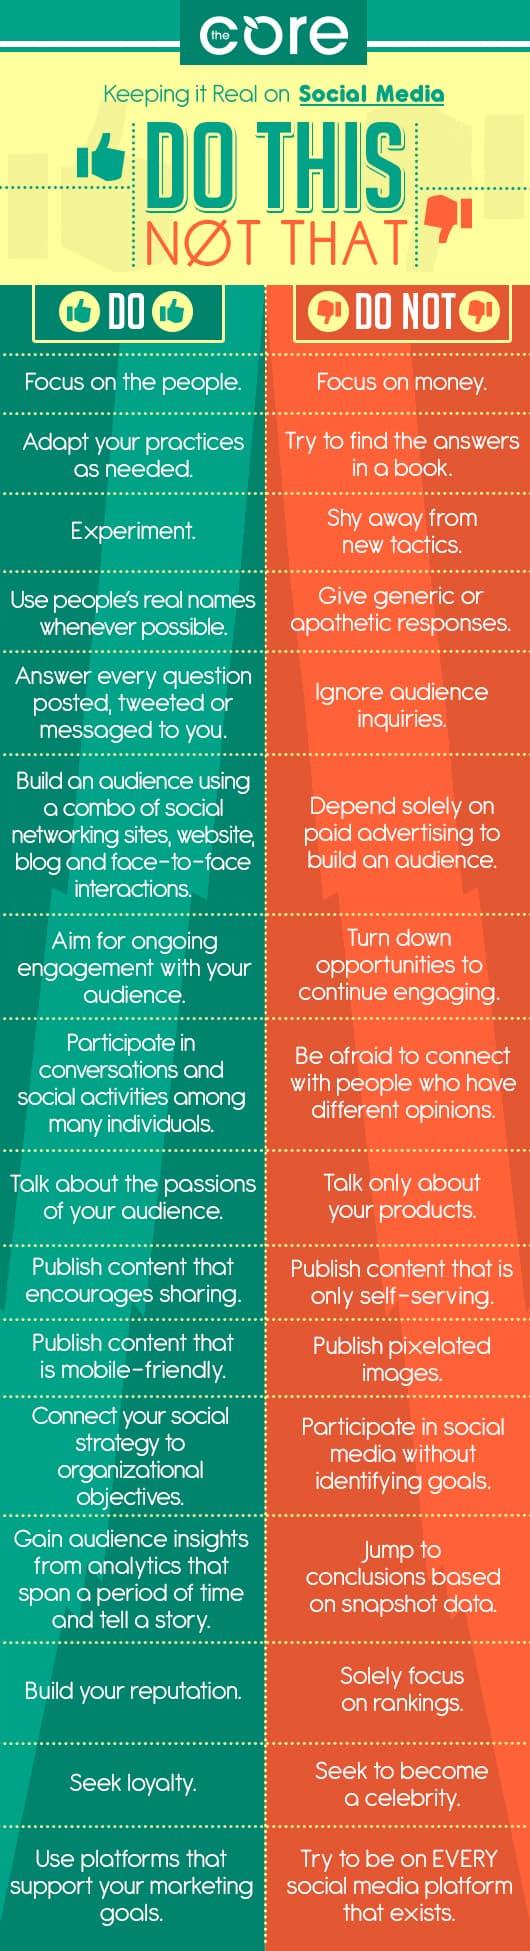 16 Social Media Marketing Mistakes to Avoid [Infographic]